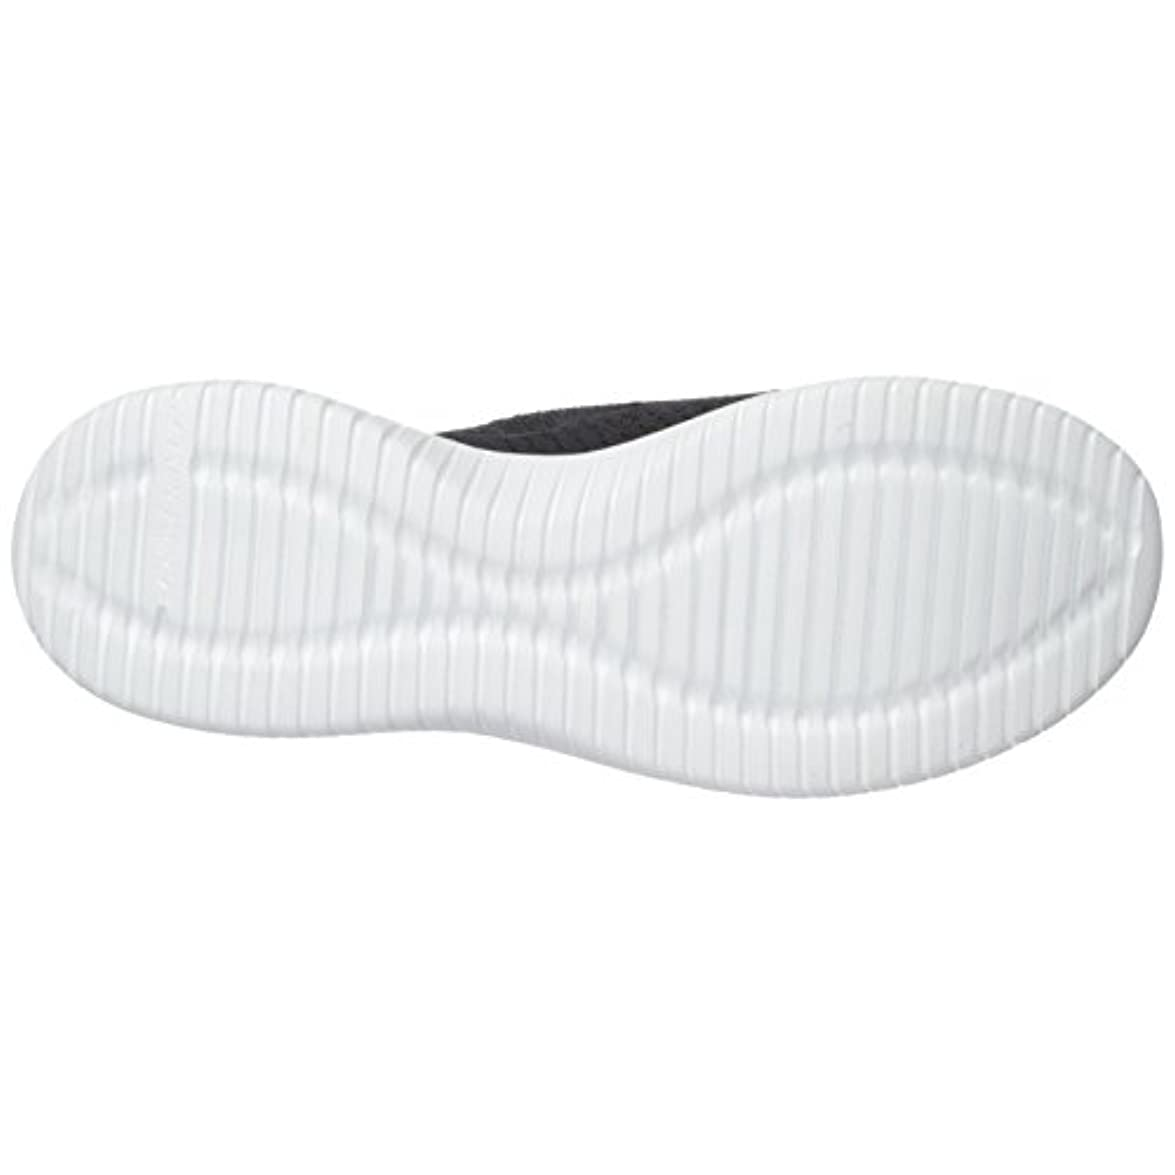 Skechers Ultra Flex Statements Sneakers Donna Nero black white Bkw